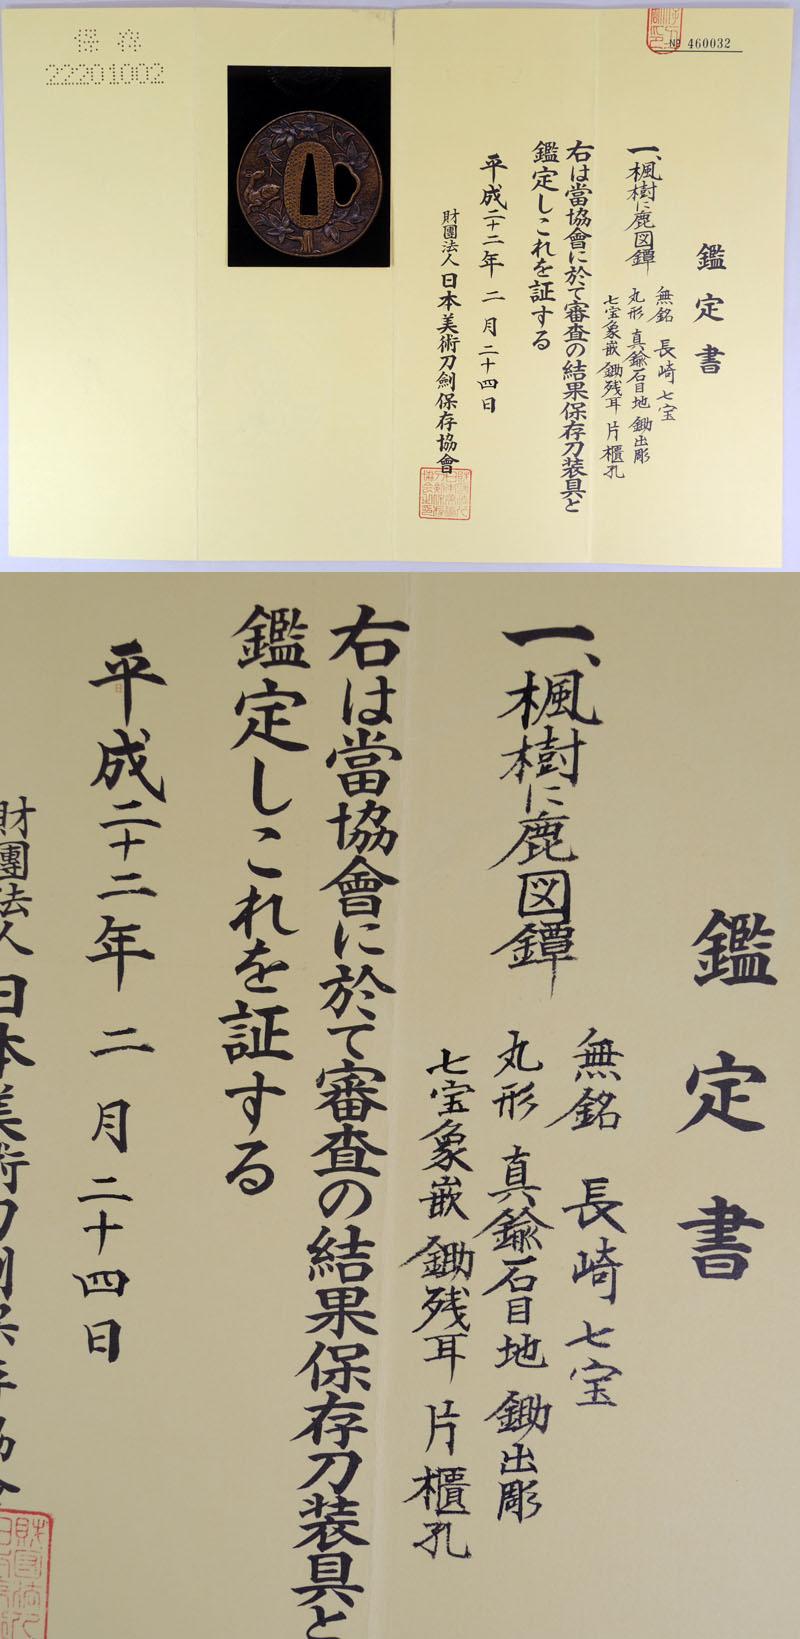 楓樹に鹿図鍔 無銘 長崎七宝 Picture of Certificate